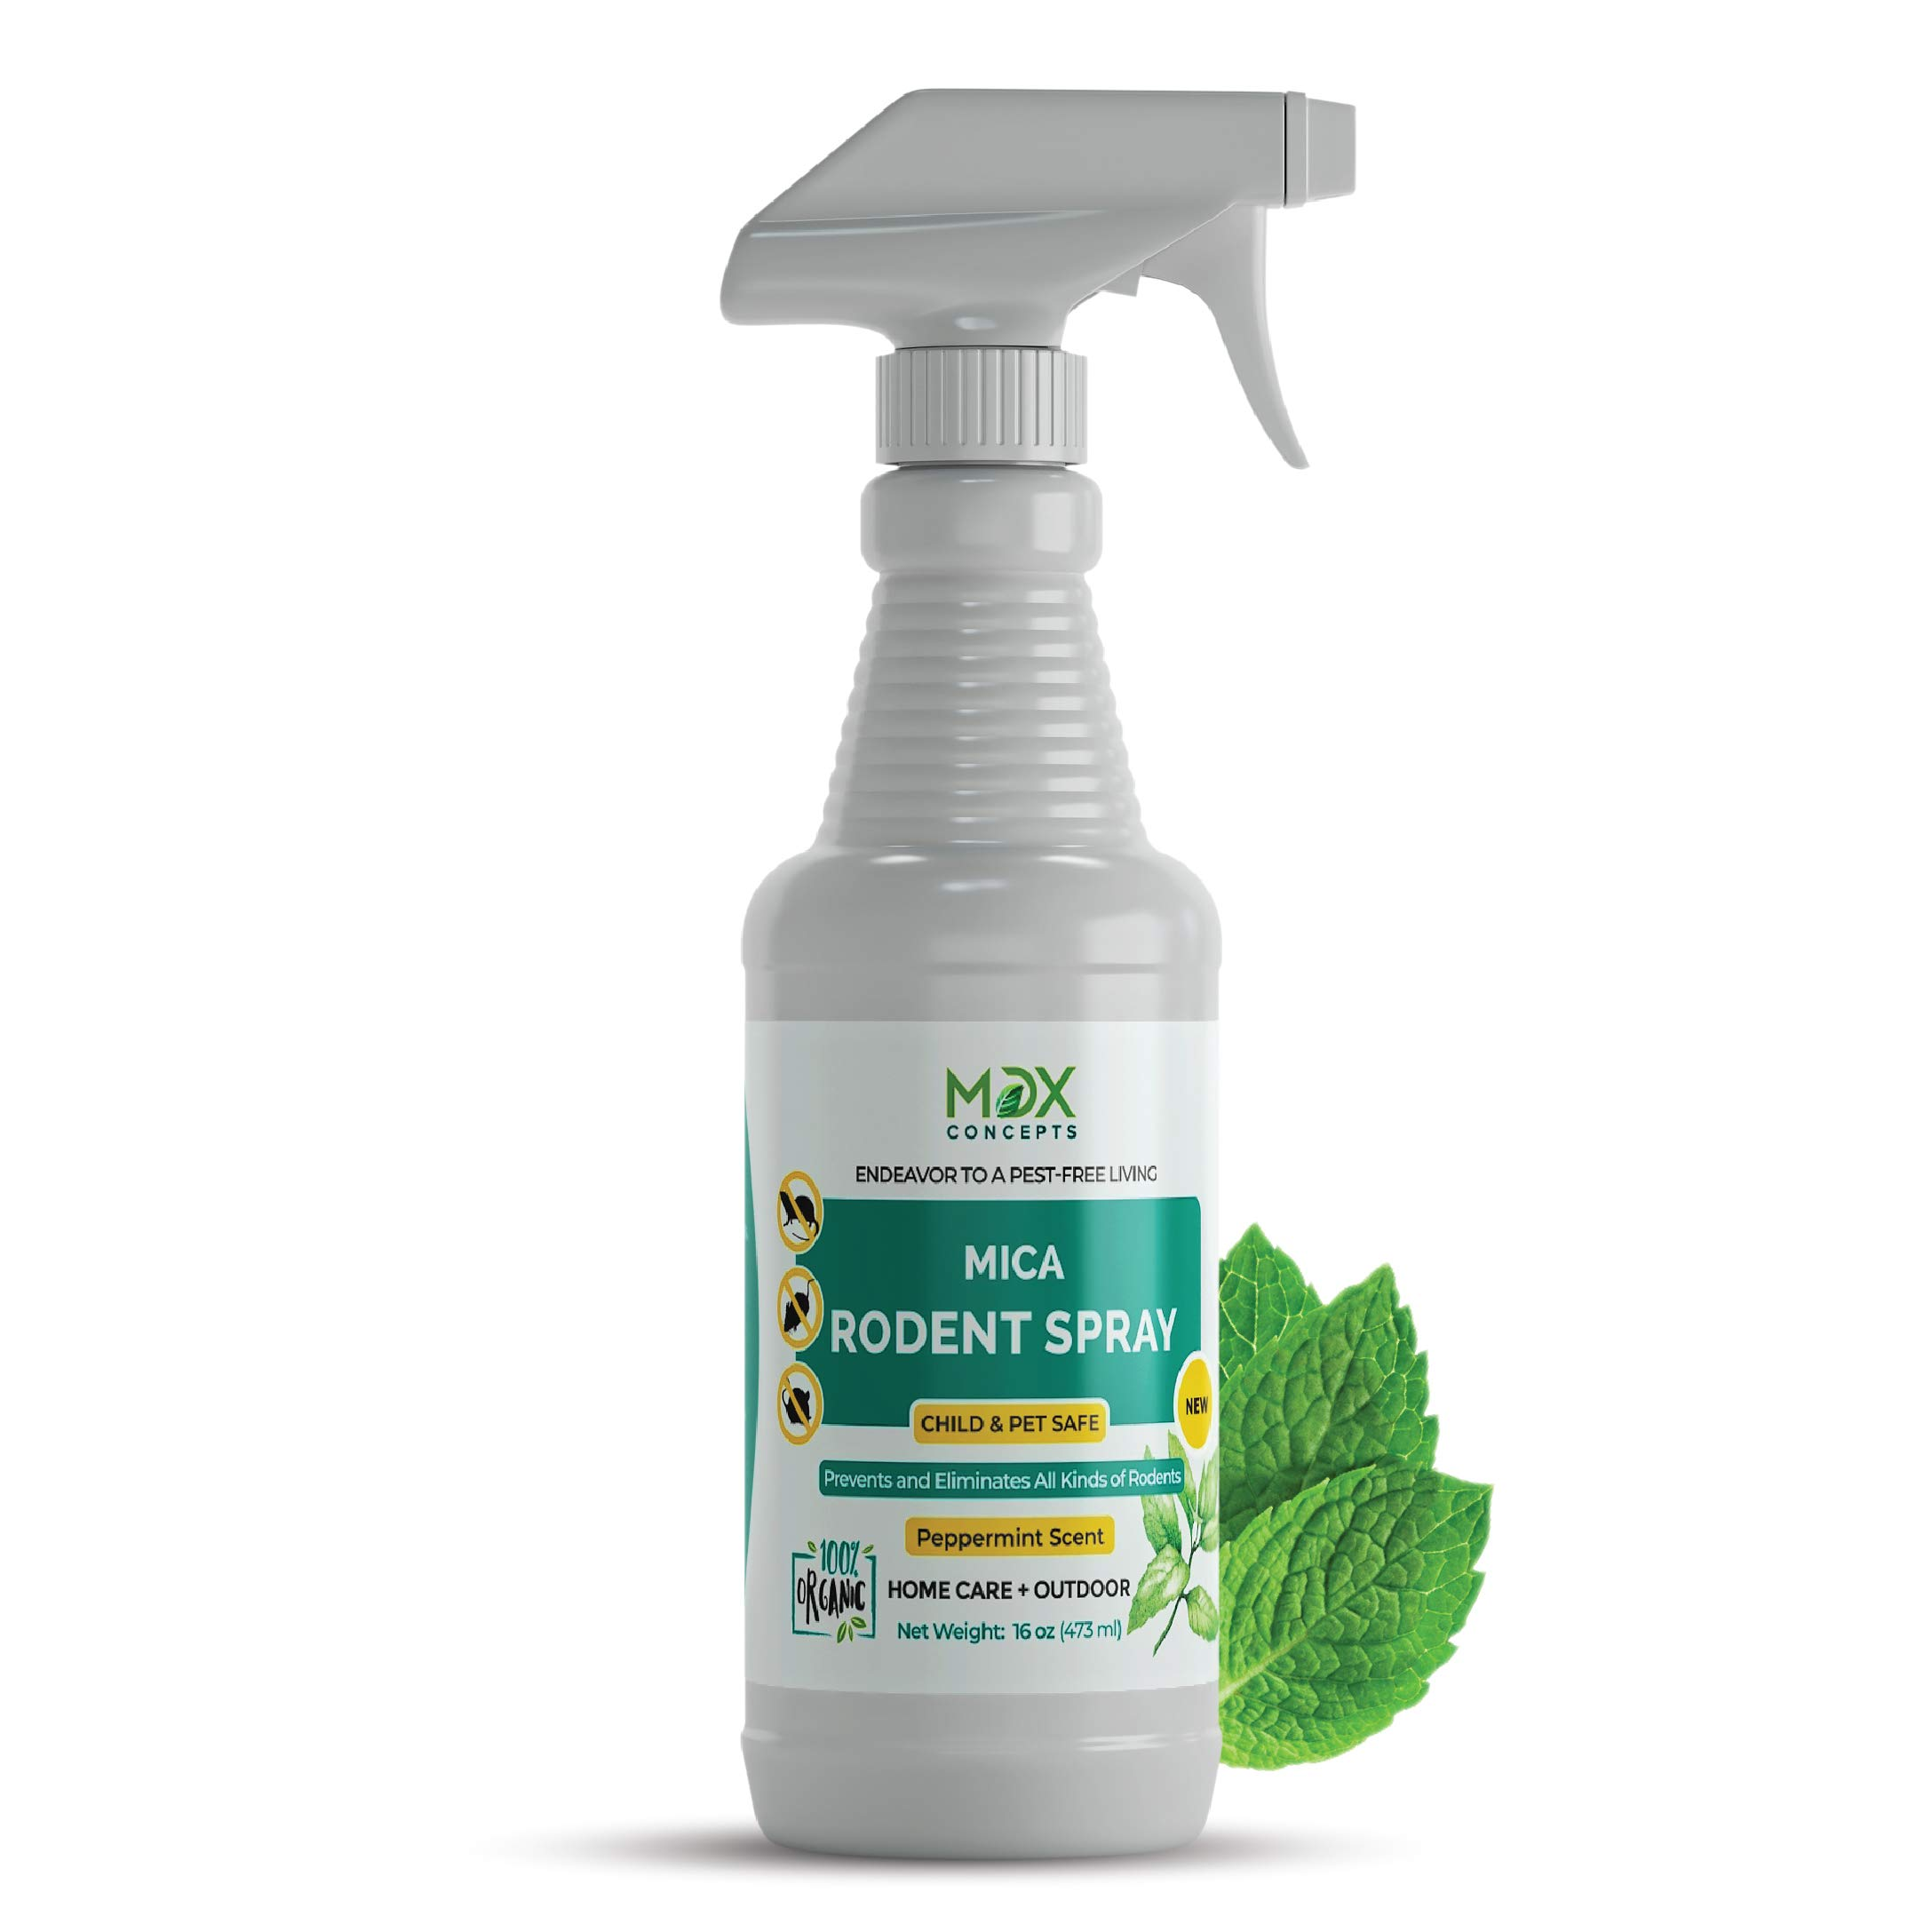 MDXconcepts Mice Repellent Substitute Guaranteed